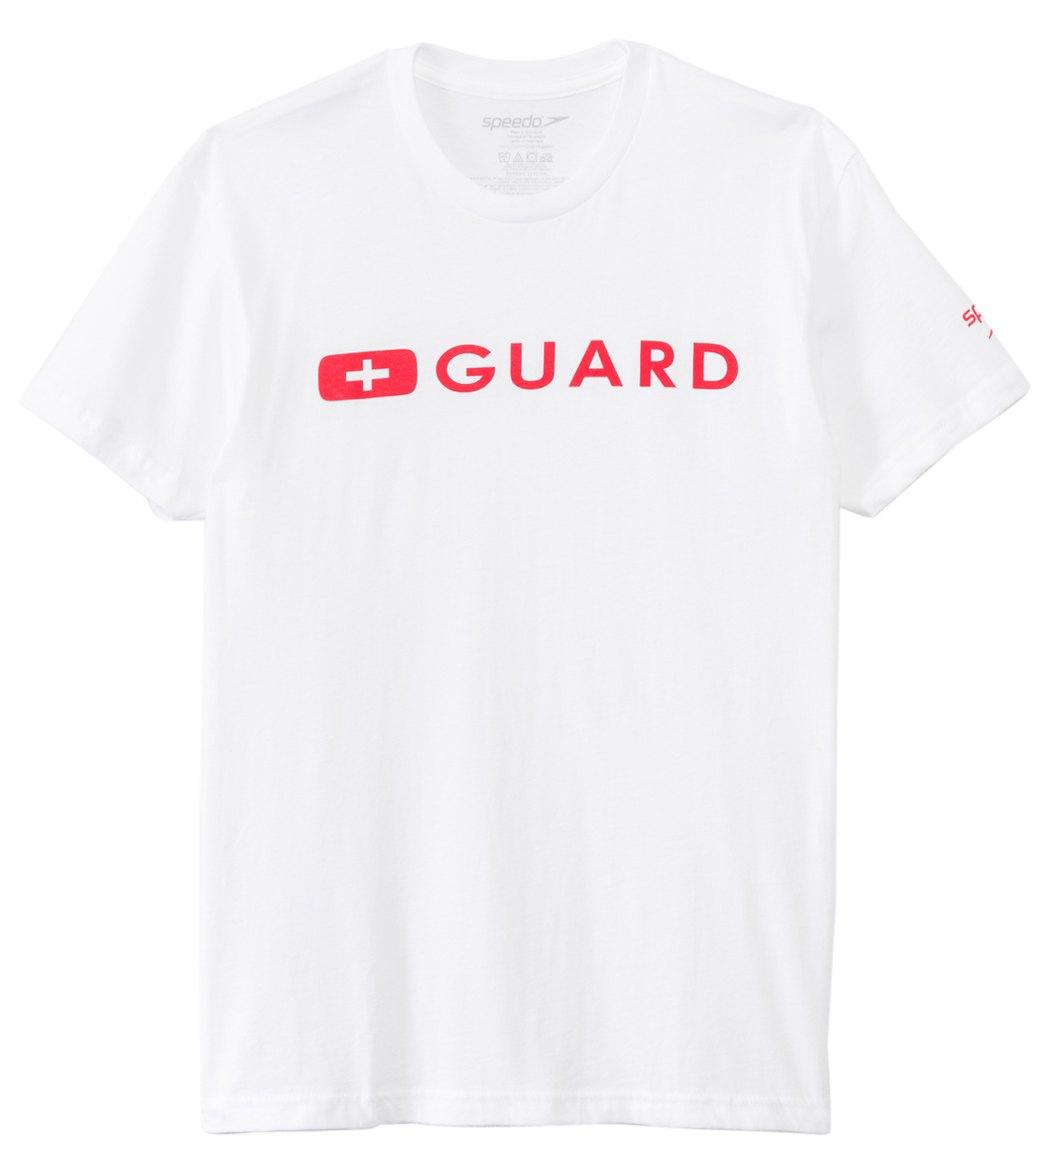 c125301caa244c Speedo Lifeguard Men s T-Shirt at SwimOutlet.com